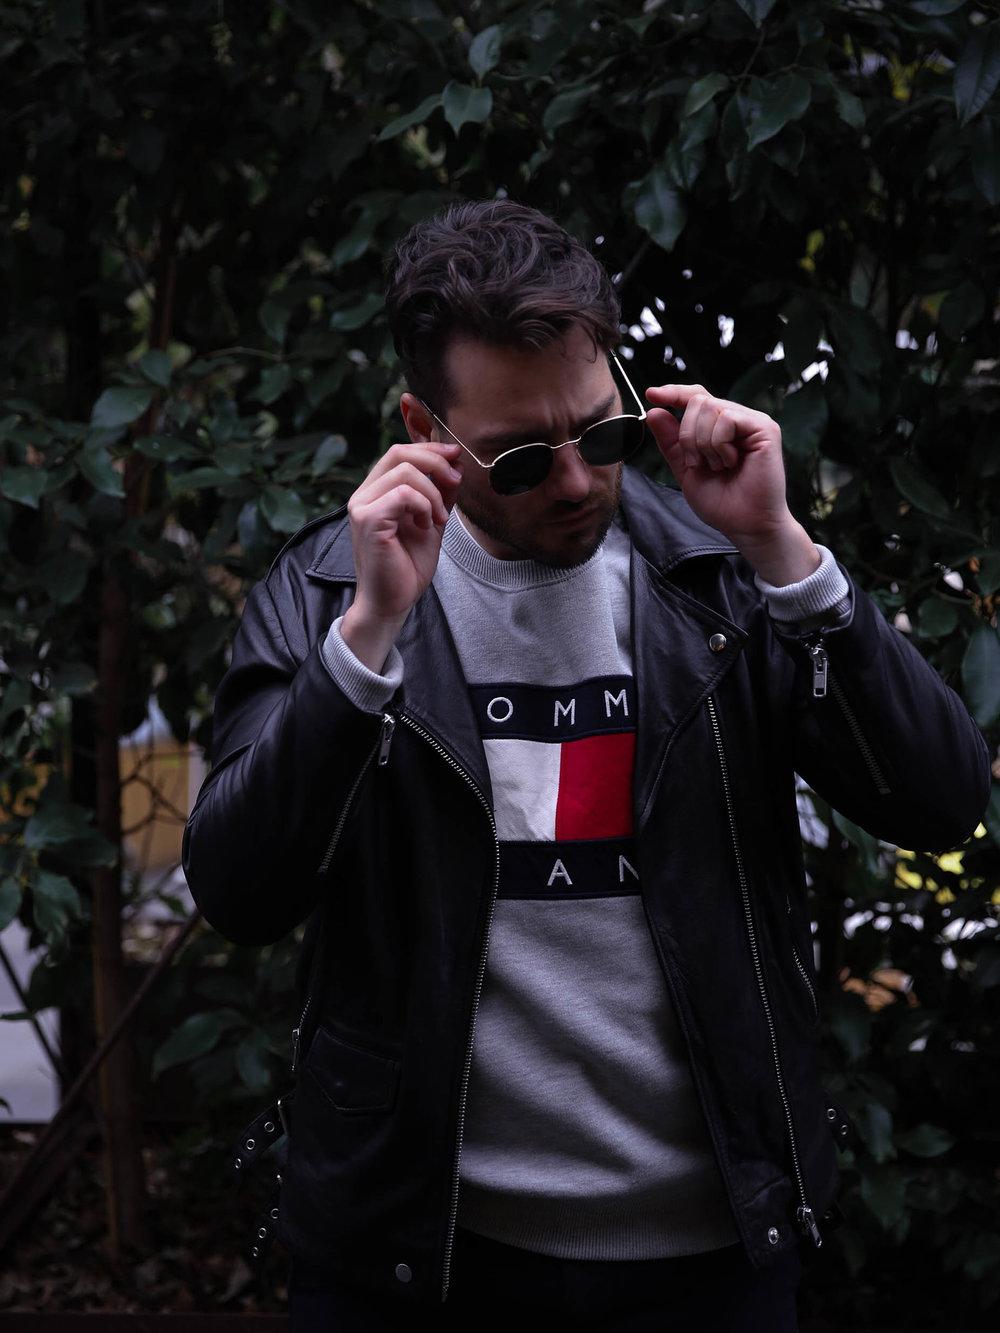 harrison_bailey_nelson_jaheb_barnett_mens_fashion_blogger_new_zealand